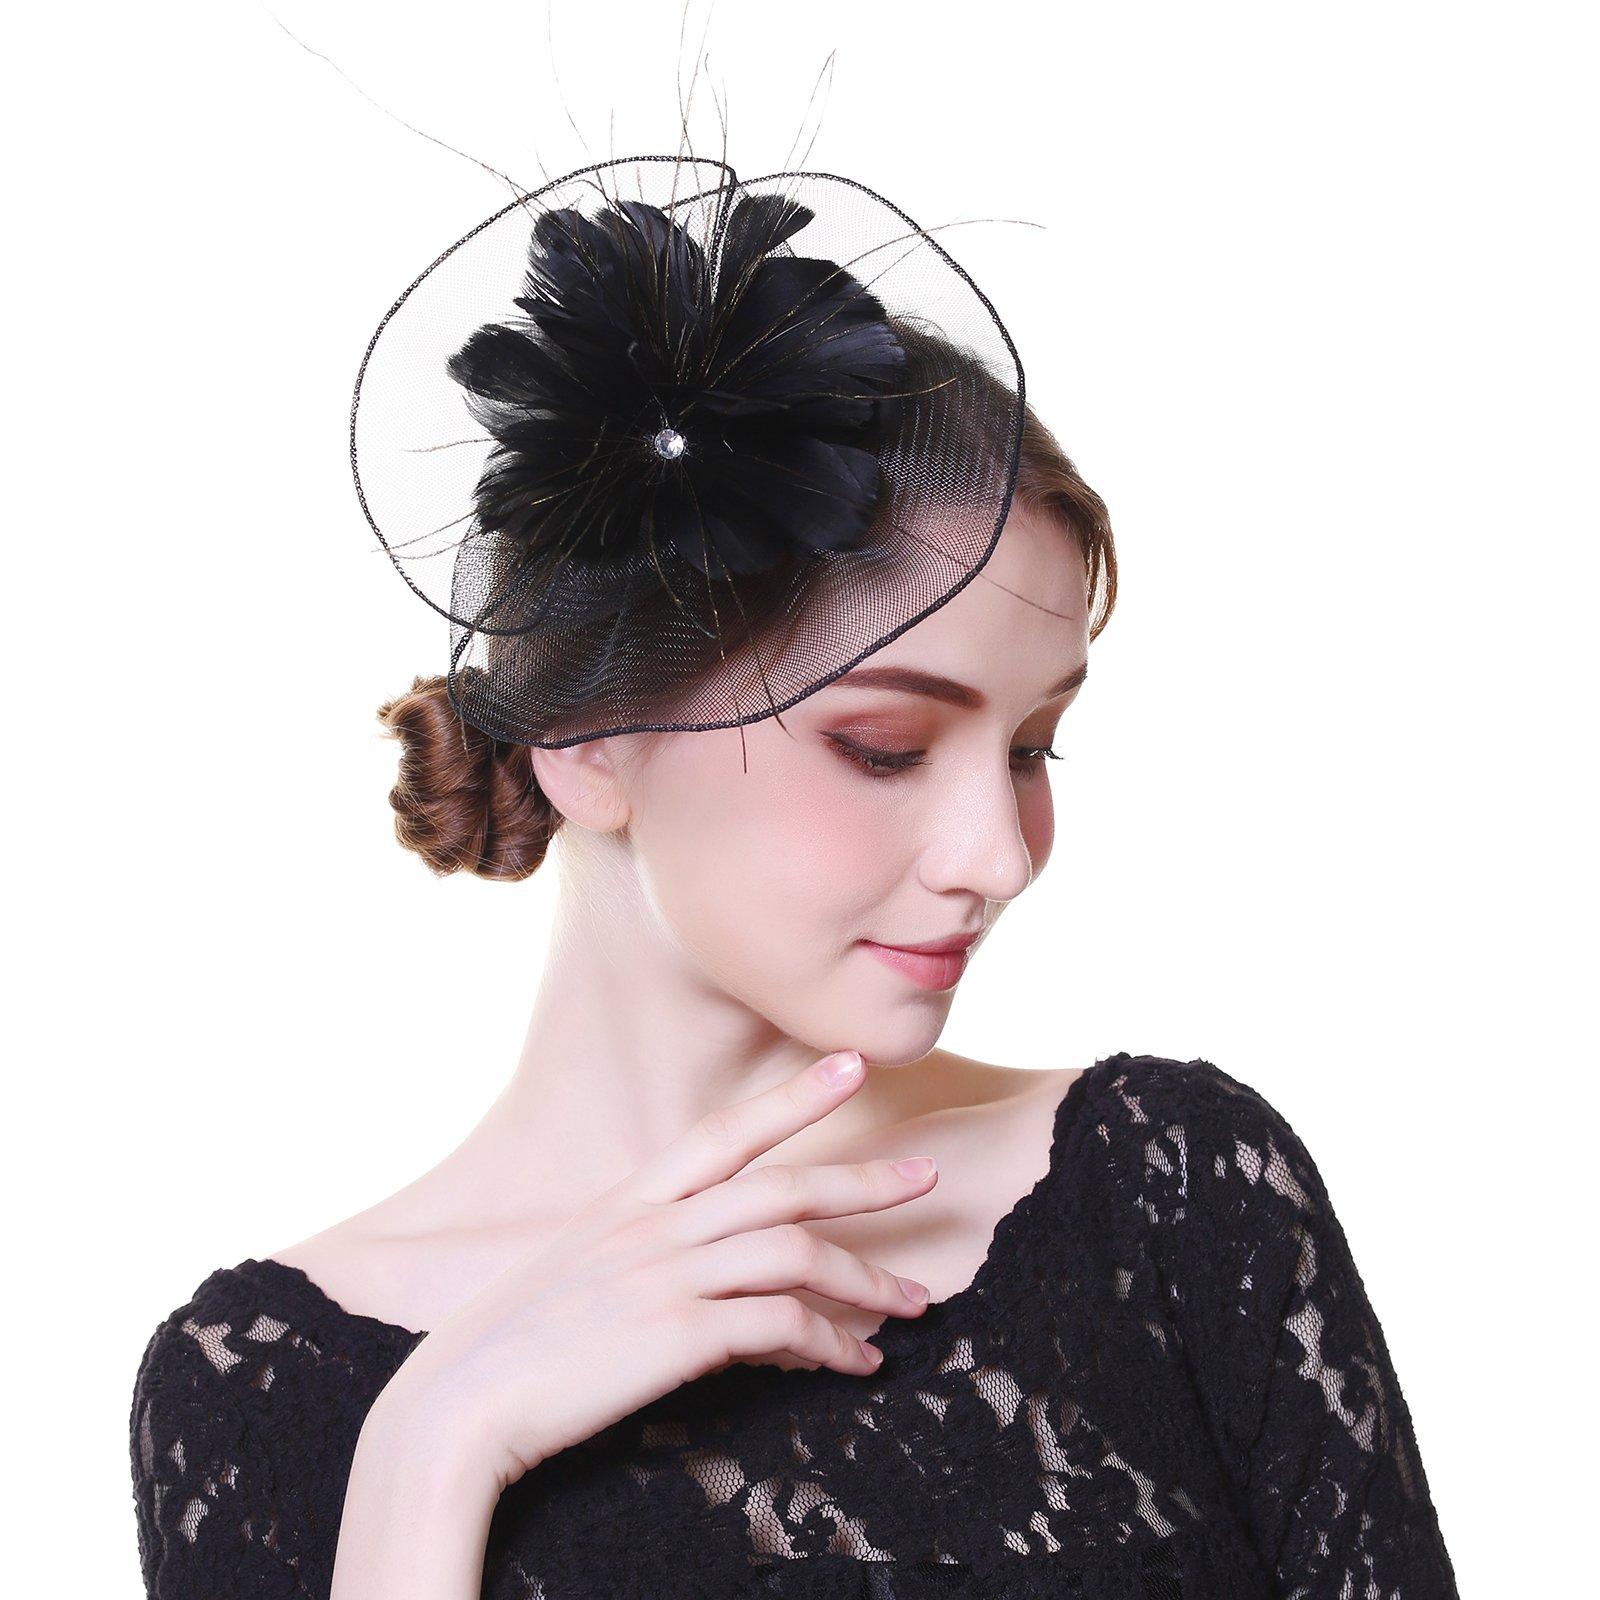 AWAYTR Fascinator Hat Mesh Flower Headwear Feathers on The Top Woman Mesh Derby Church Cap